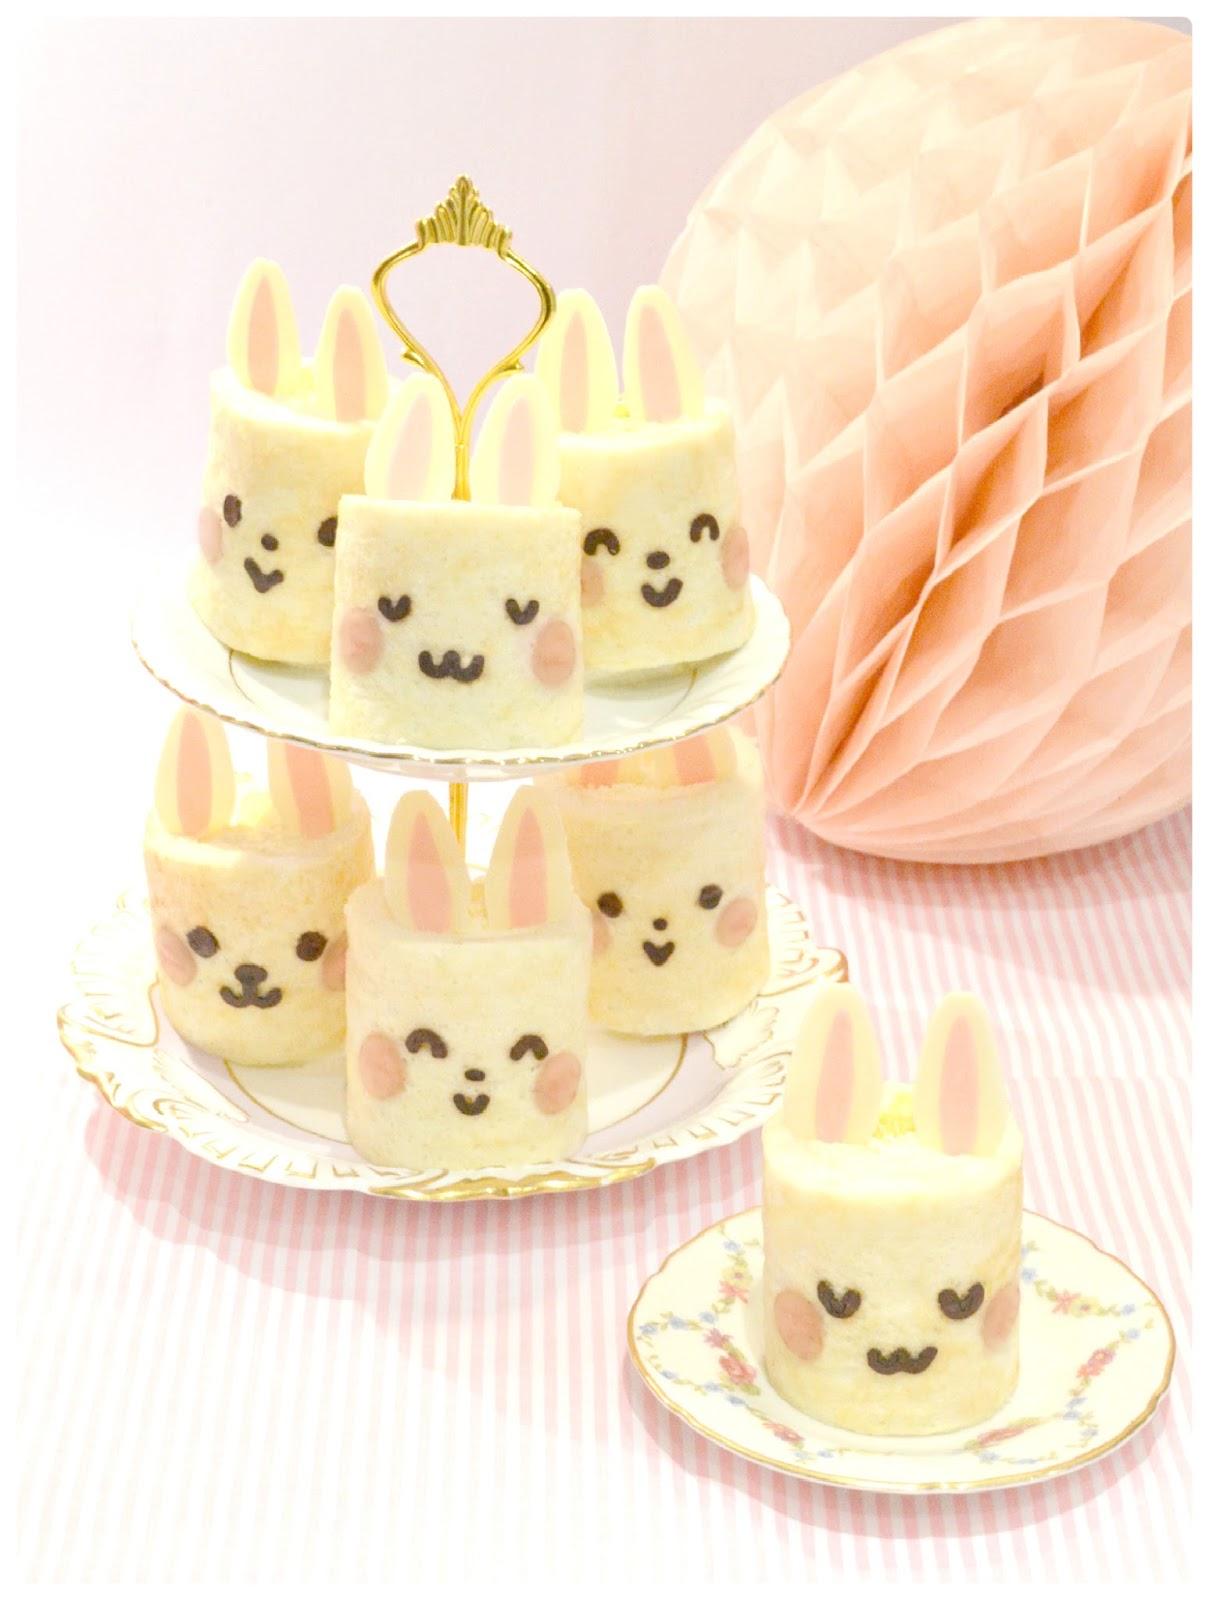 Japanese Deco Bunny Rabbit Roll Cake Birthday Cake London Cherie Kelly